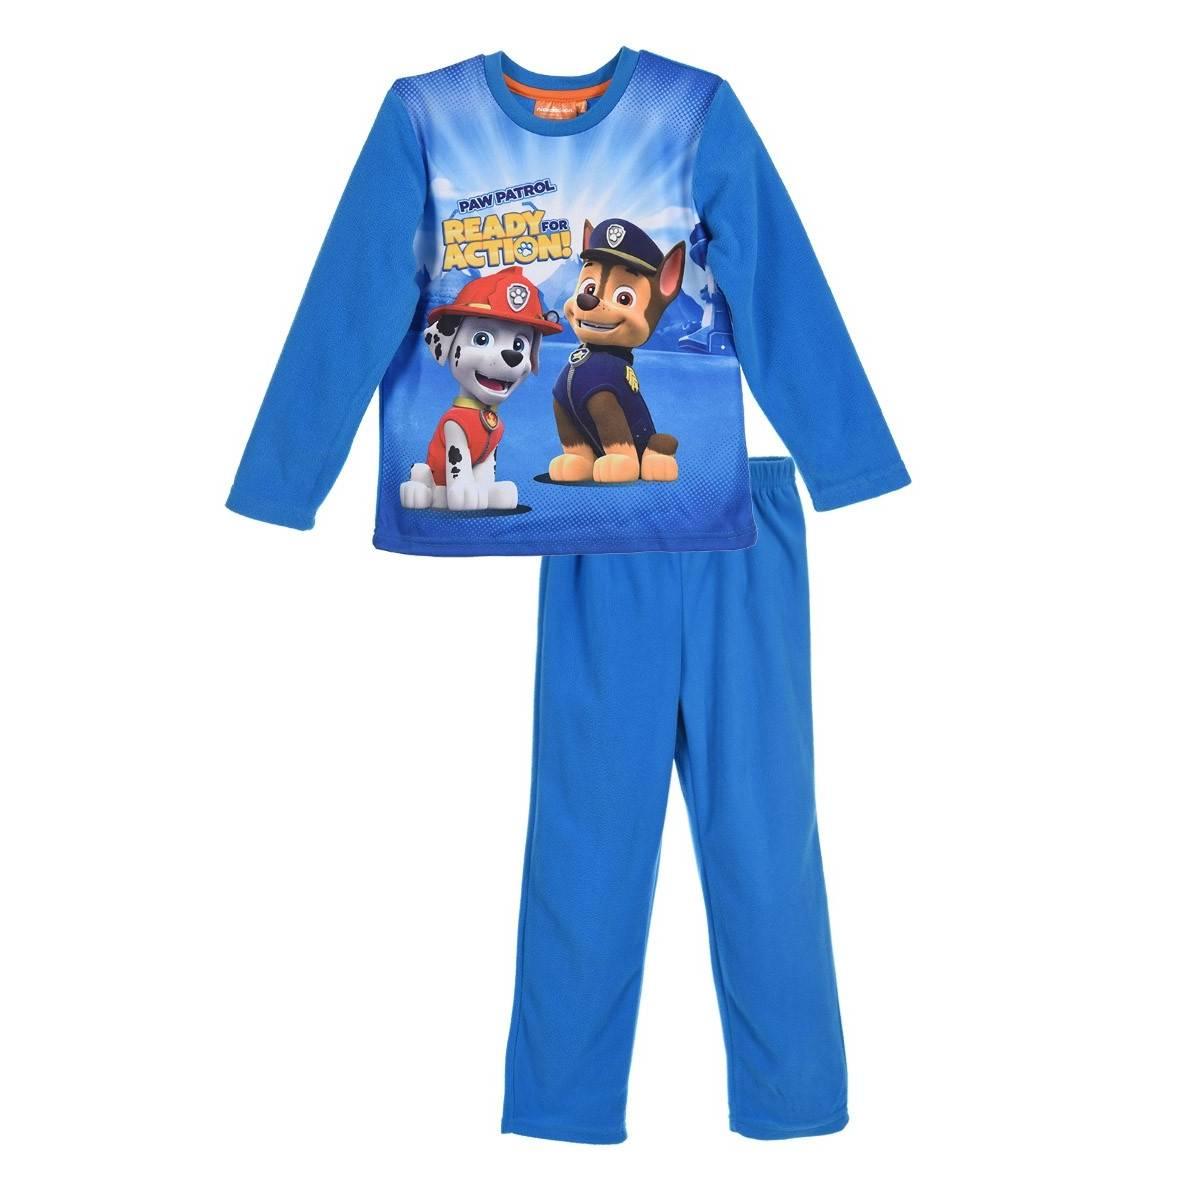 17140ce1746af La Pat'Patrouille - Pyjama garçon matiere polaire imprimé - du 4 au ...